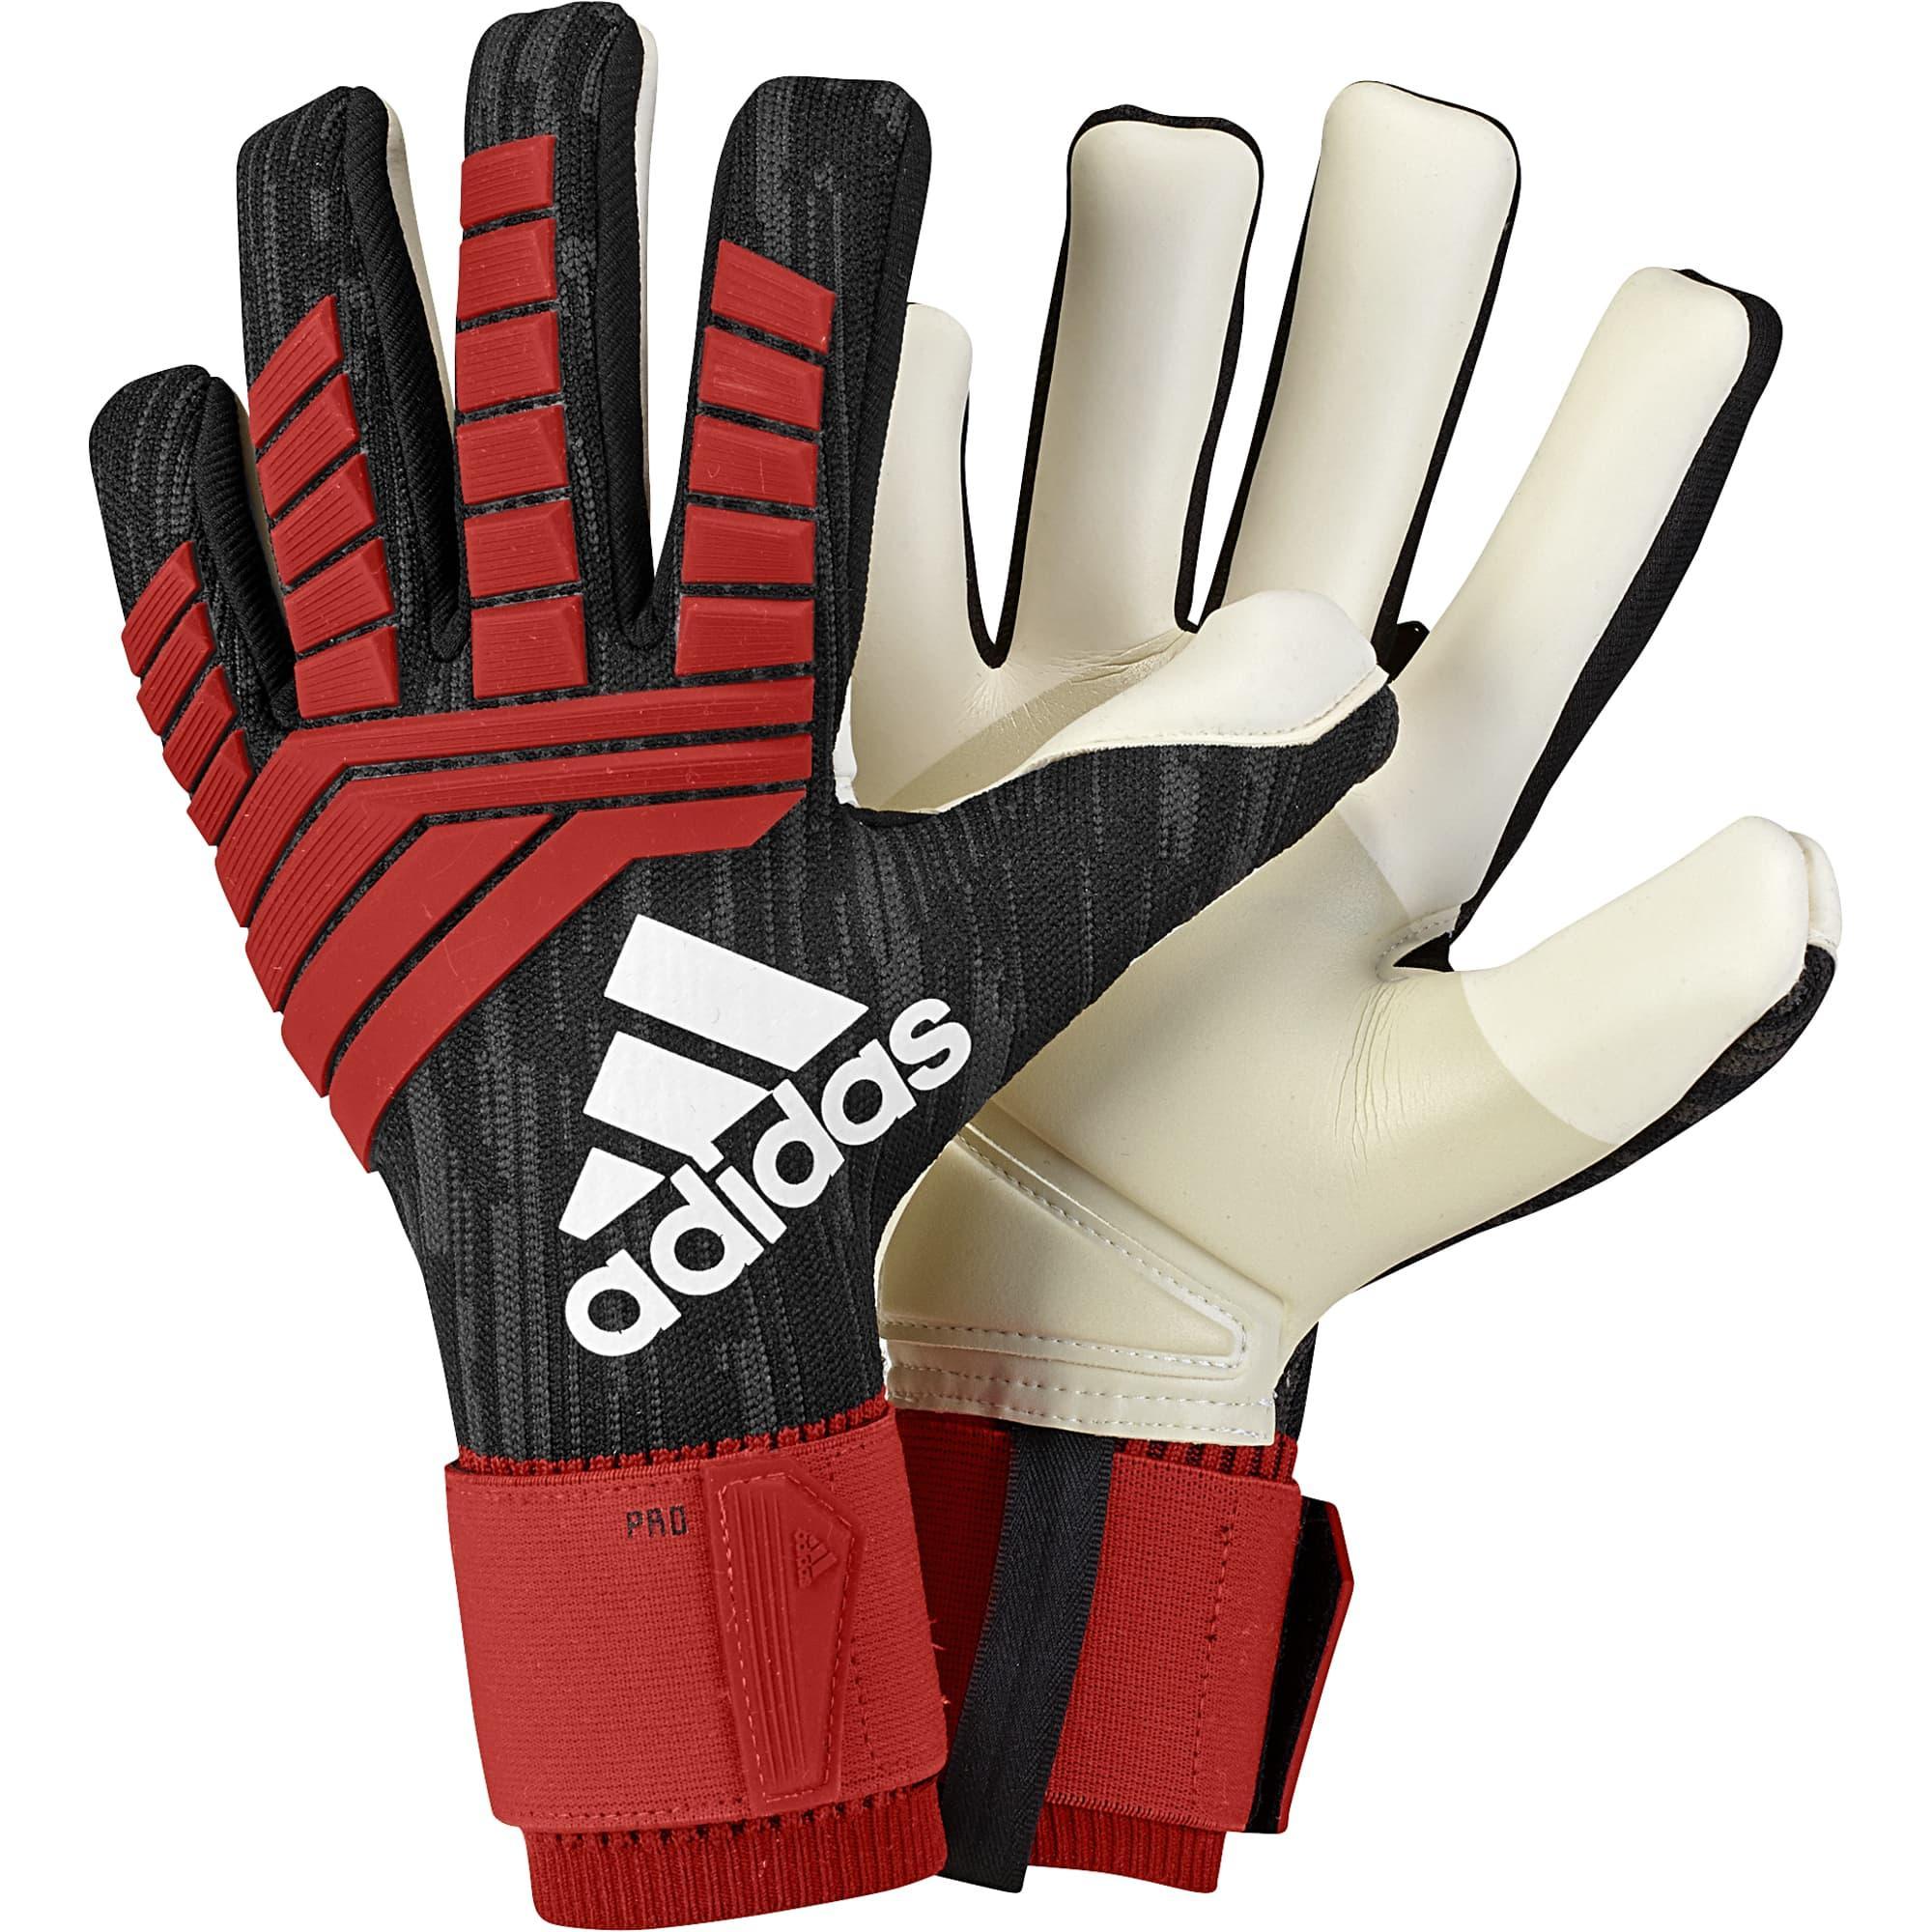 adidas Predator PRO GK Glove - Black